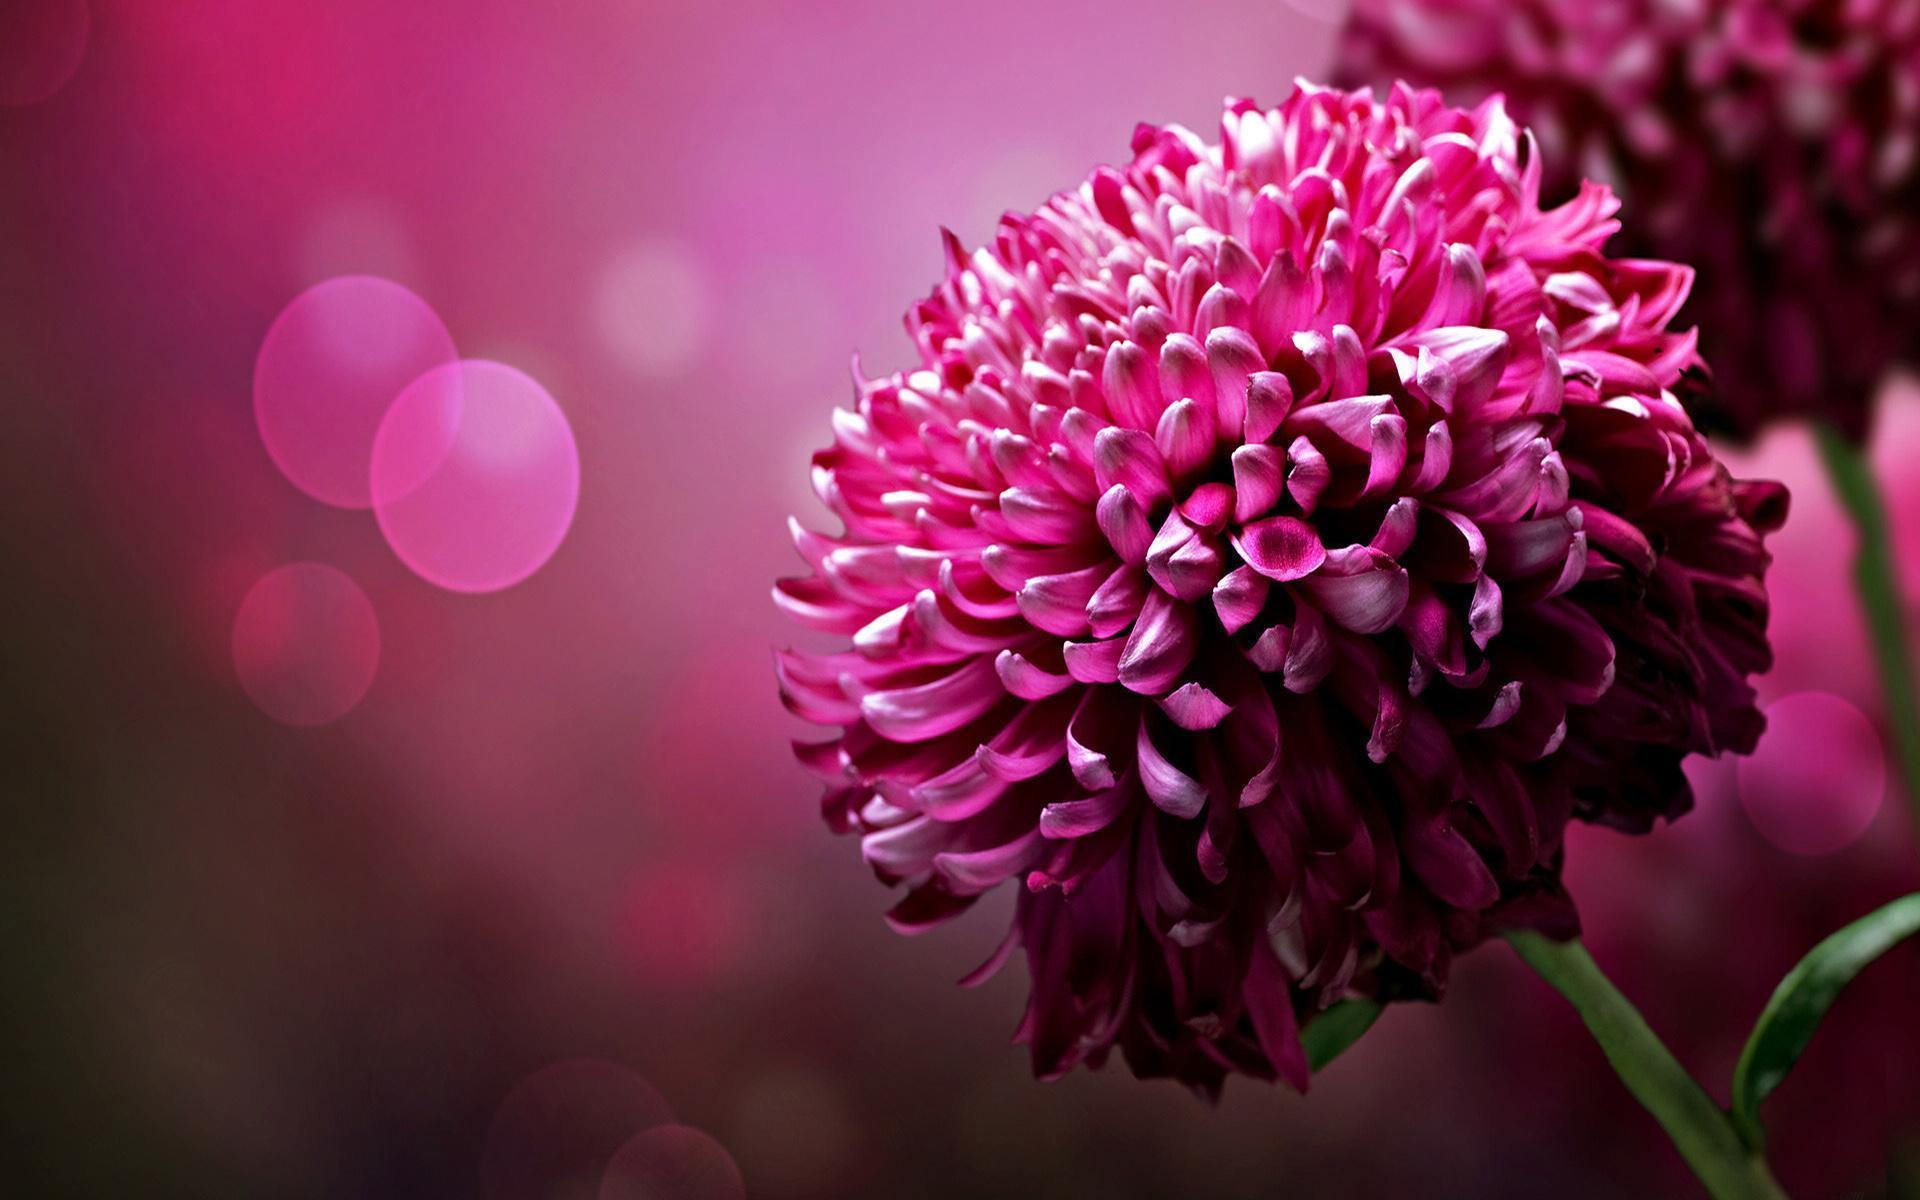 flowers image desktop backgrounds - wallpaper cave